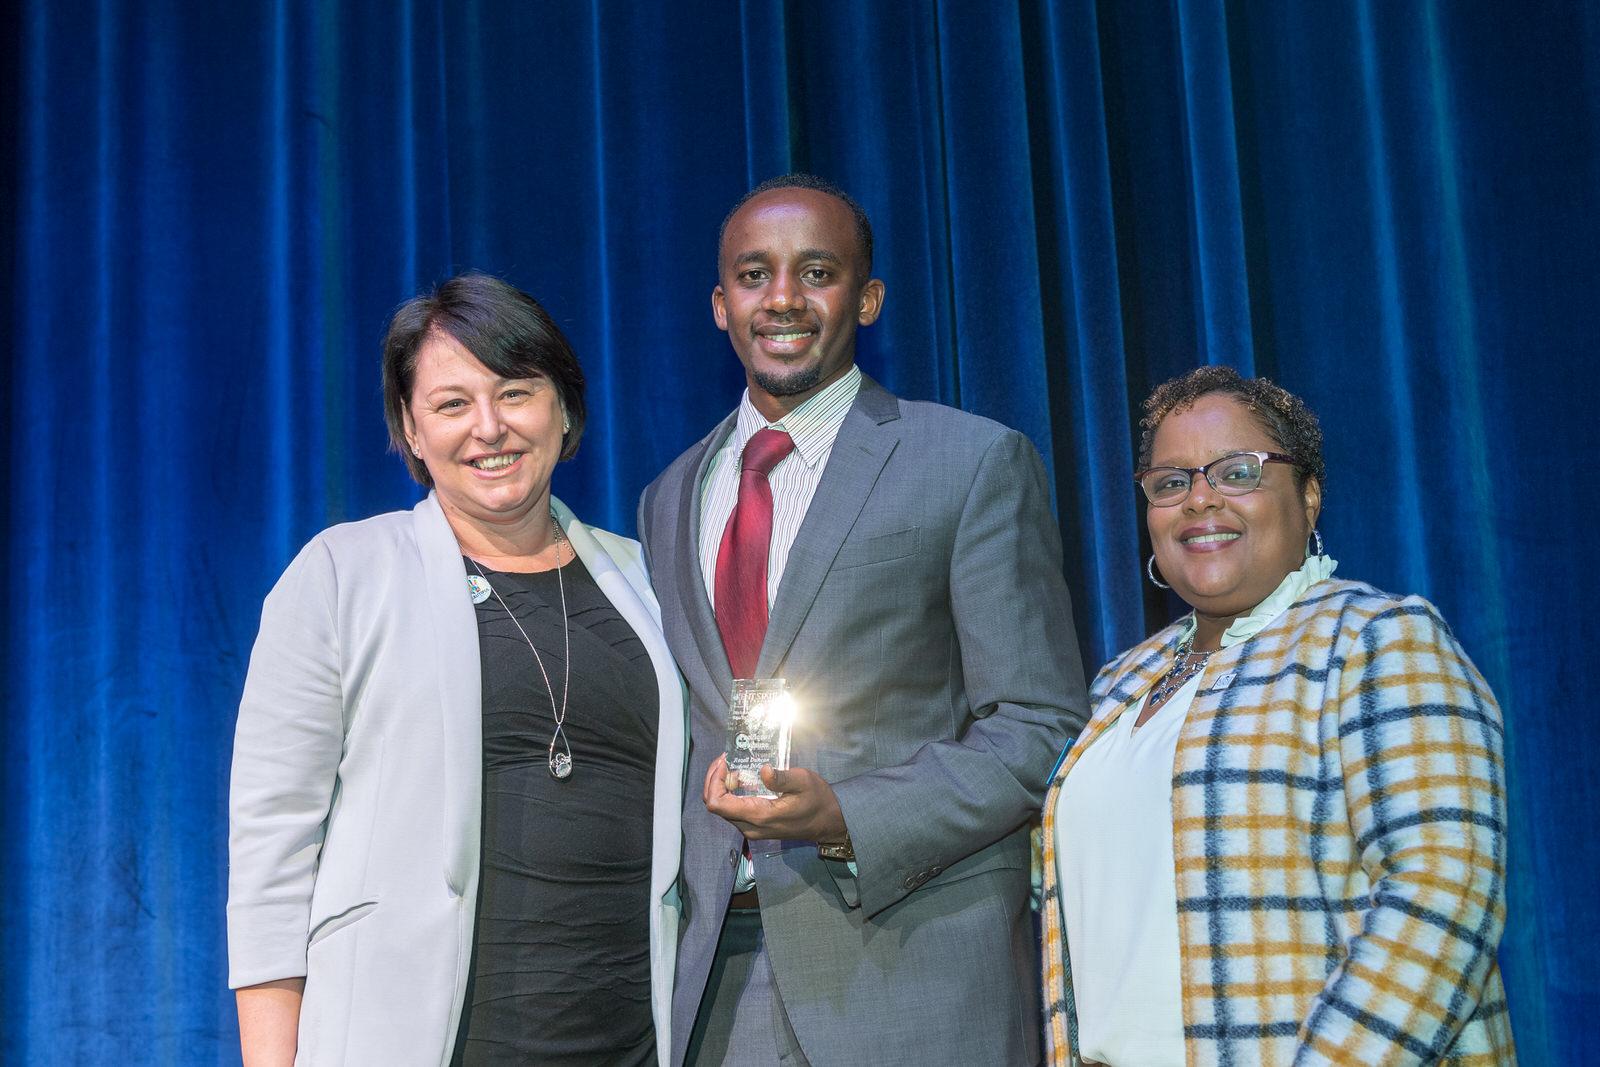 2020 Rozell Duncan Student Diversity Award Recipient, Pacifique Niyonzima